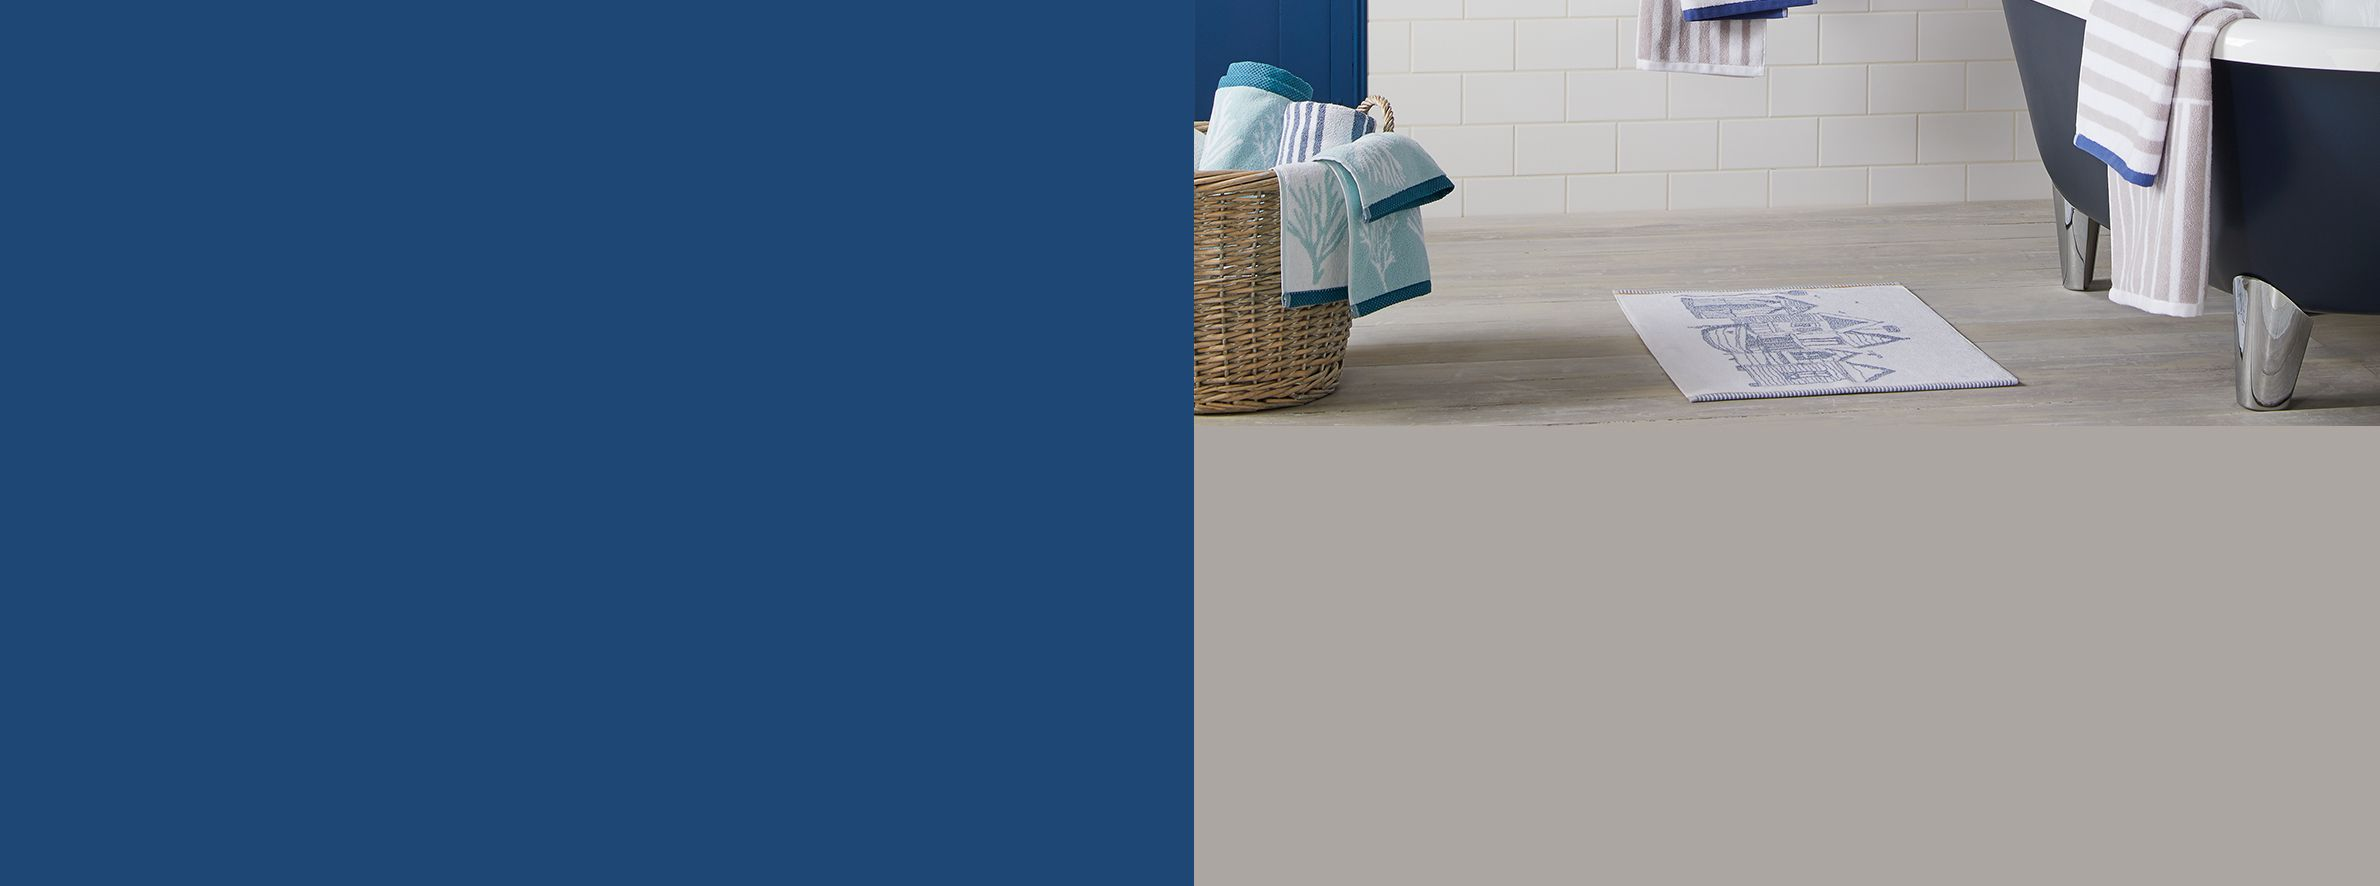 5bf065f3efb6 Bath Mats & Boards | Bobble, Deep Pile & Chunky Mats | John Lewis